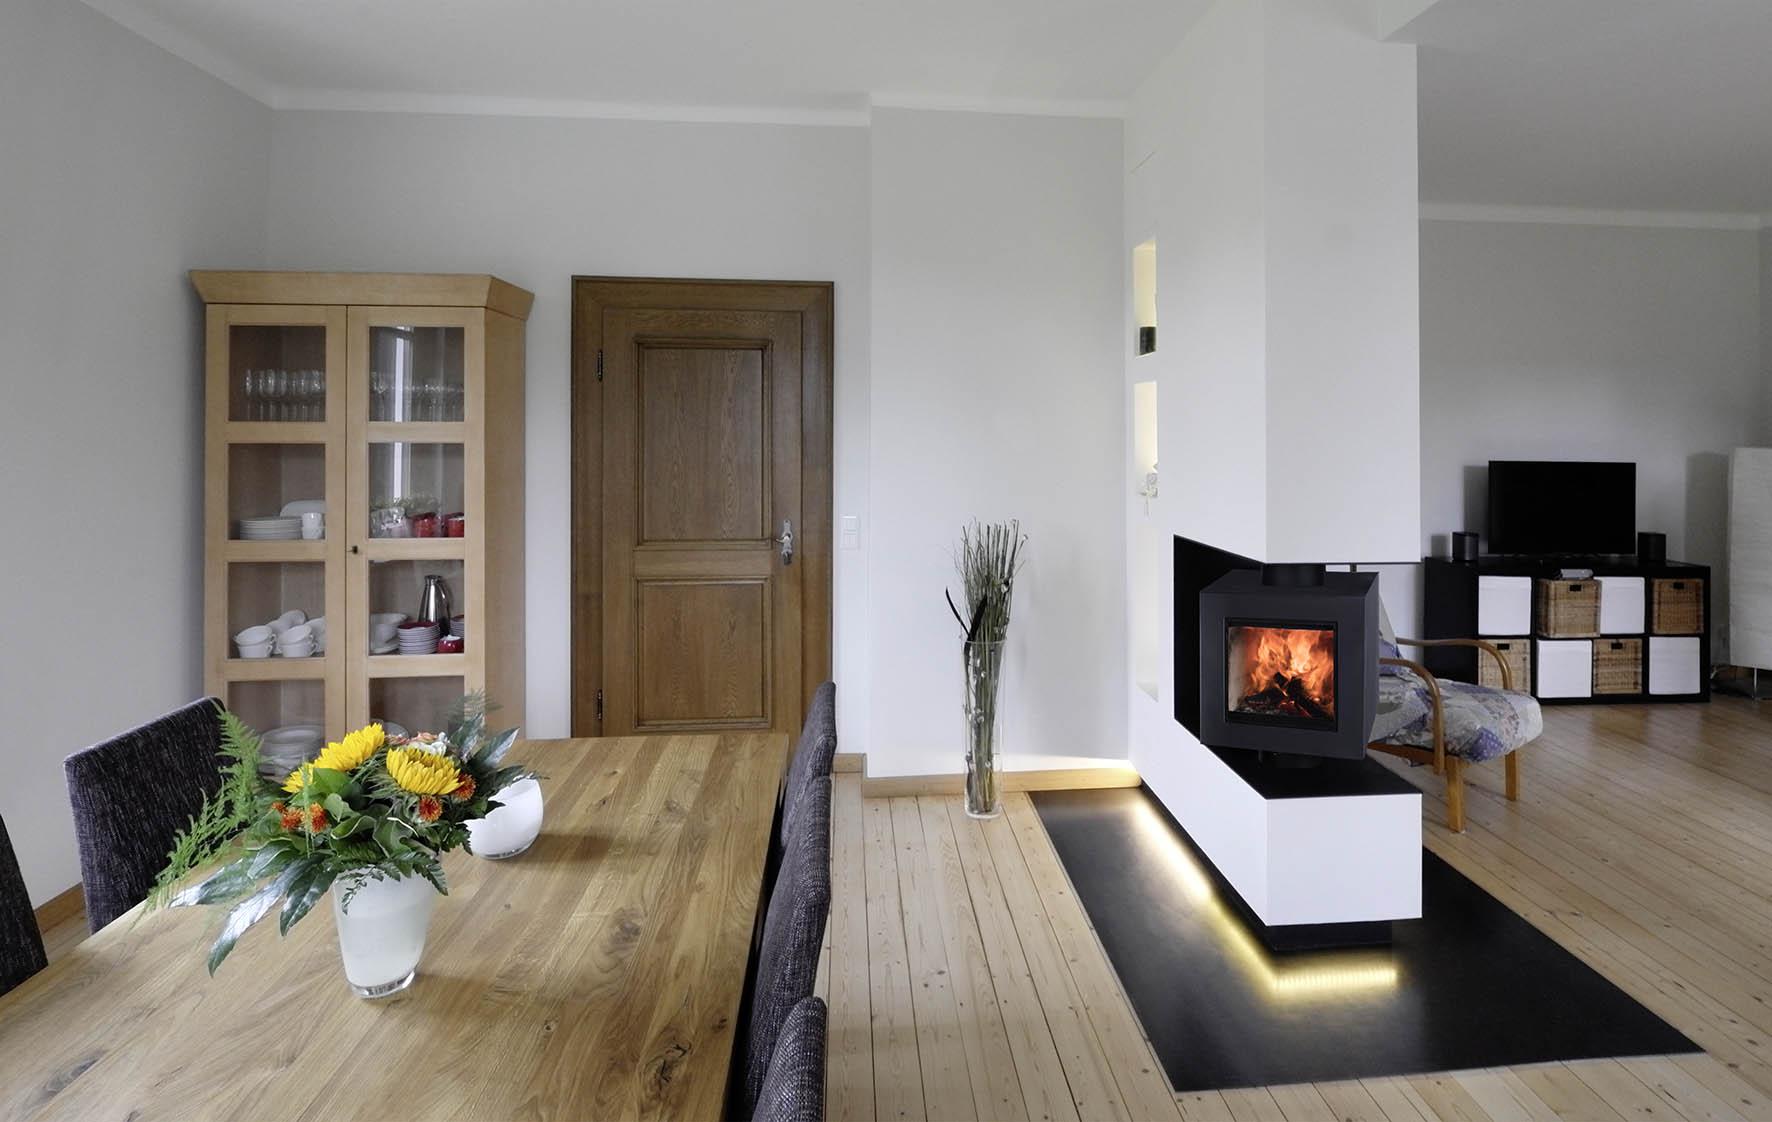 ihr panoramakamin eckkamin tunnelkamin hotline 7 21 uhr 0177 530 9030. Black Bedroom Furniture Sets. Home Design Ideas